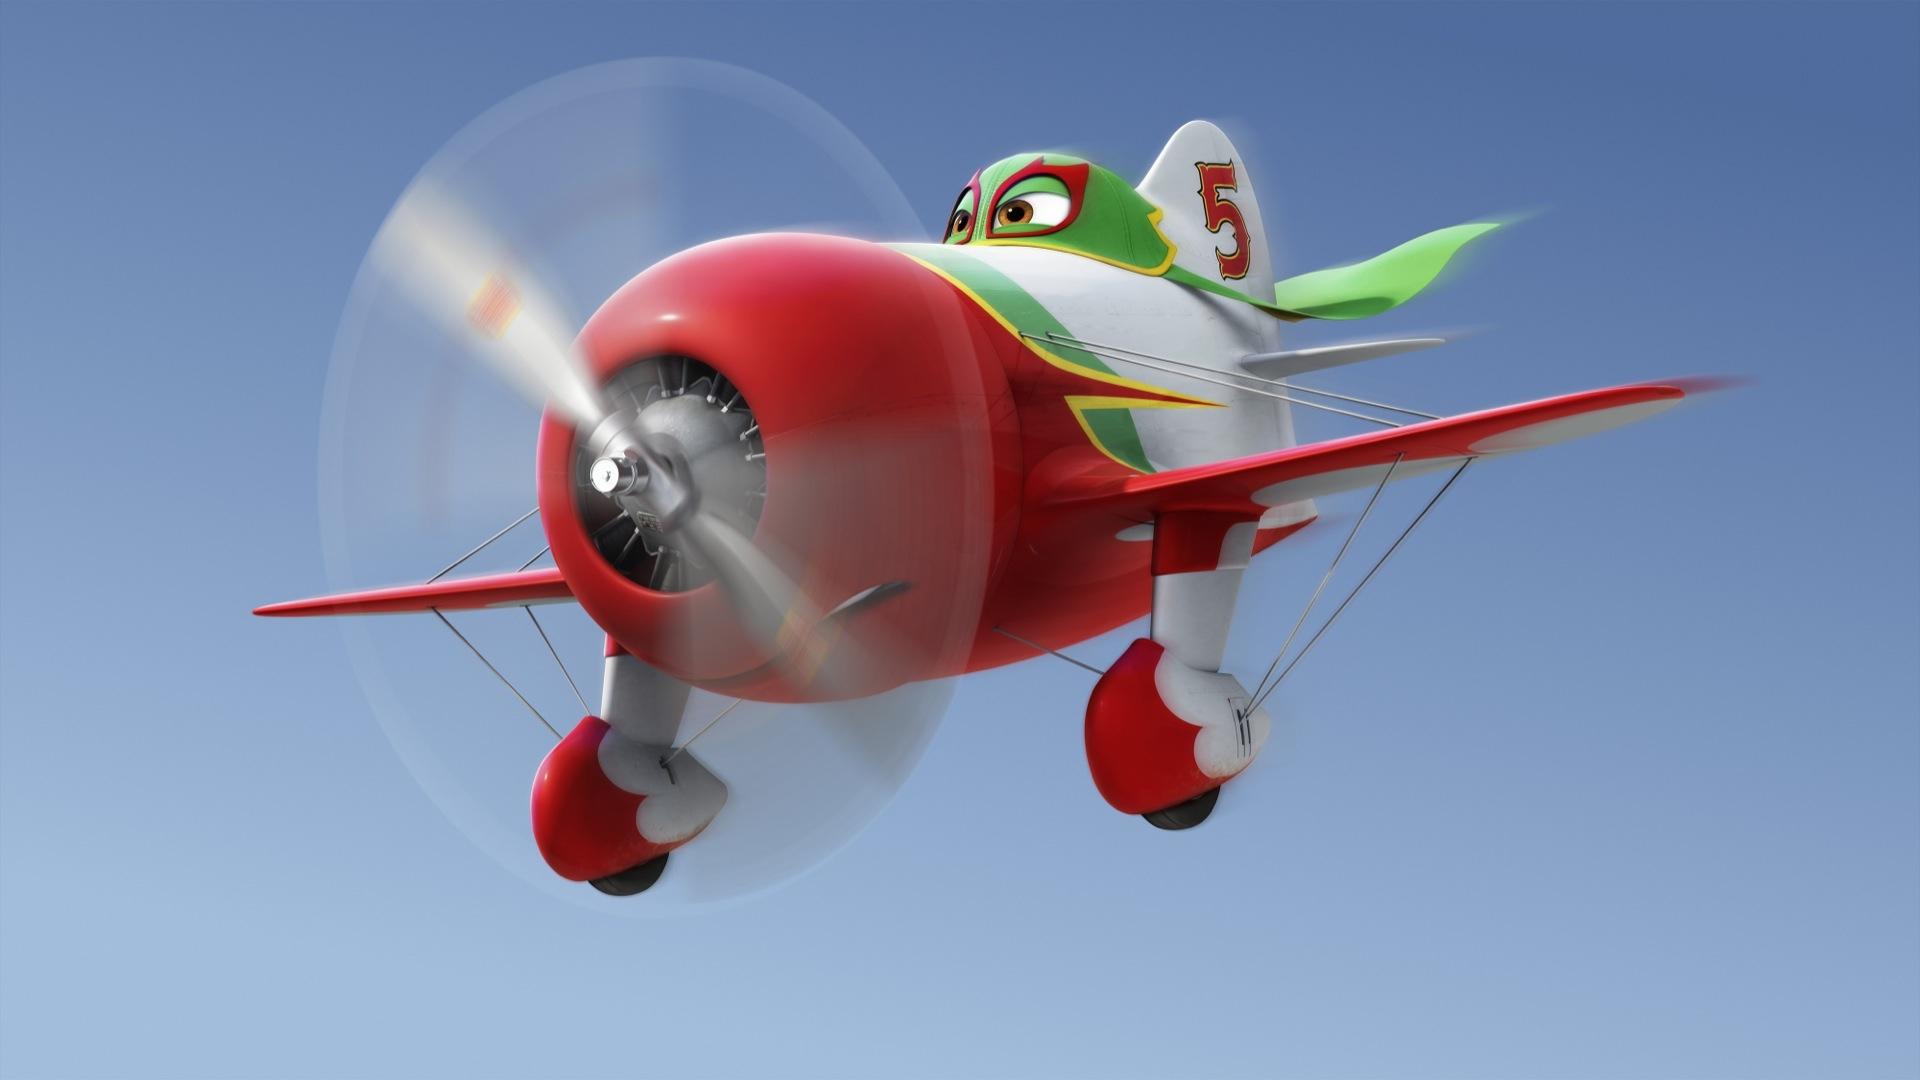 disney pixar planes free background wallpaper